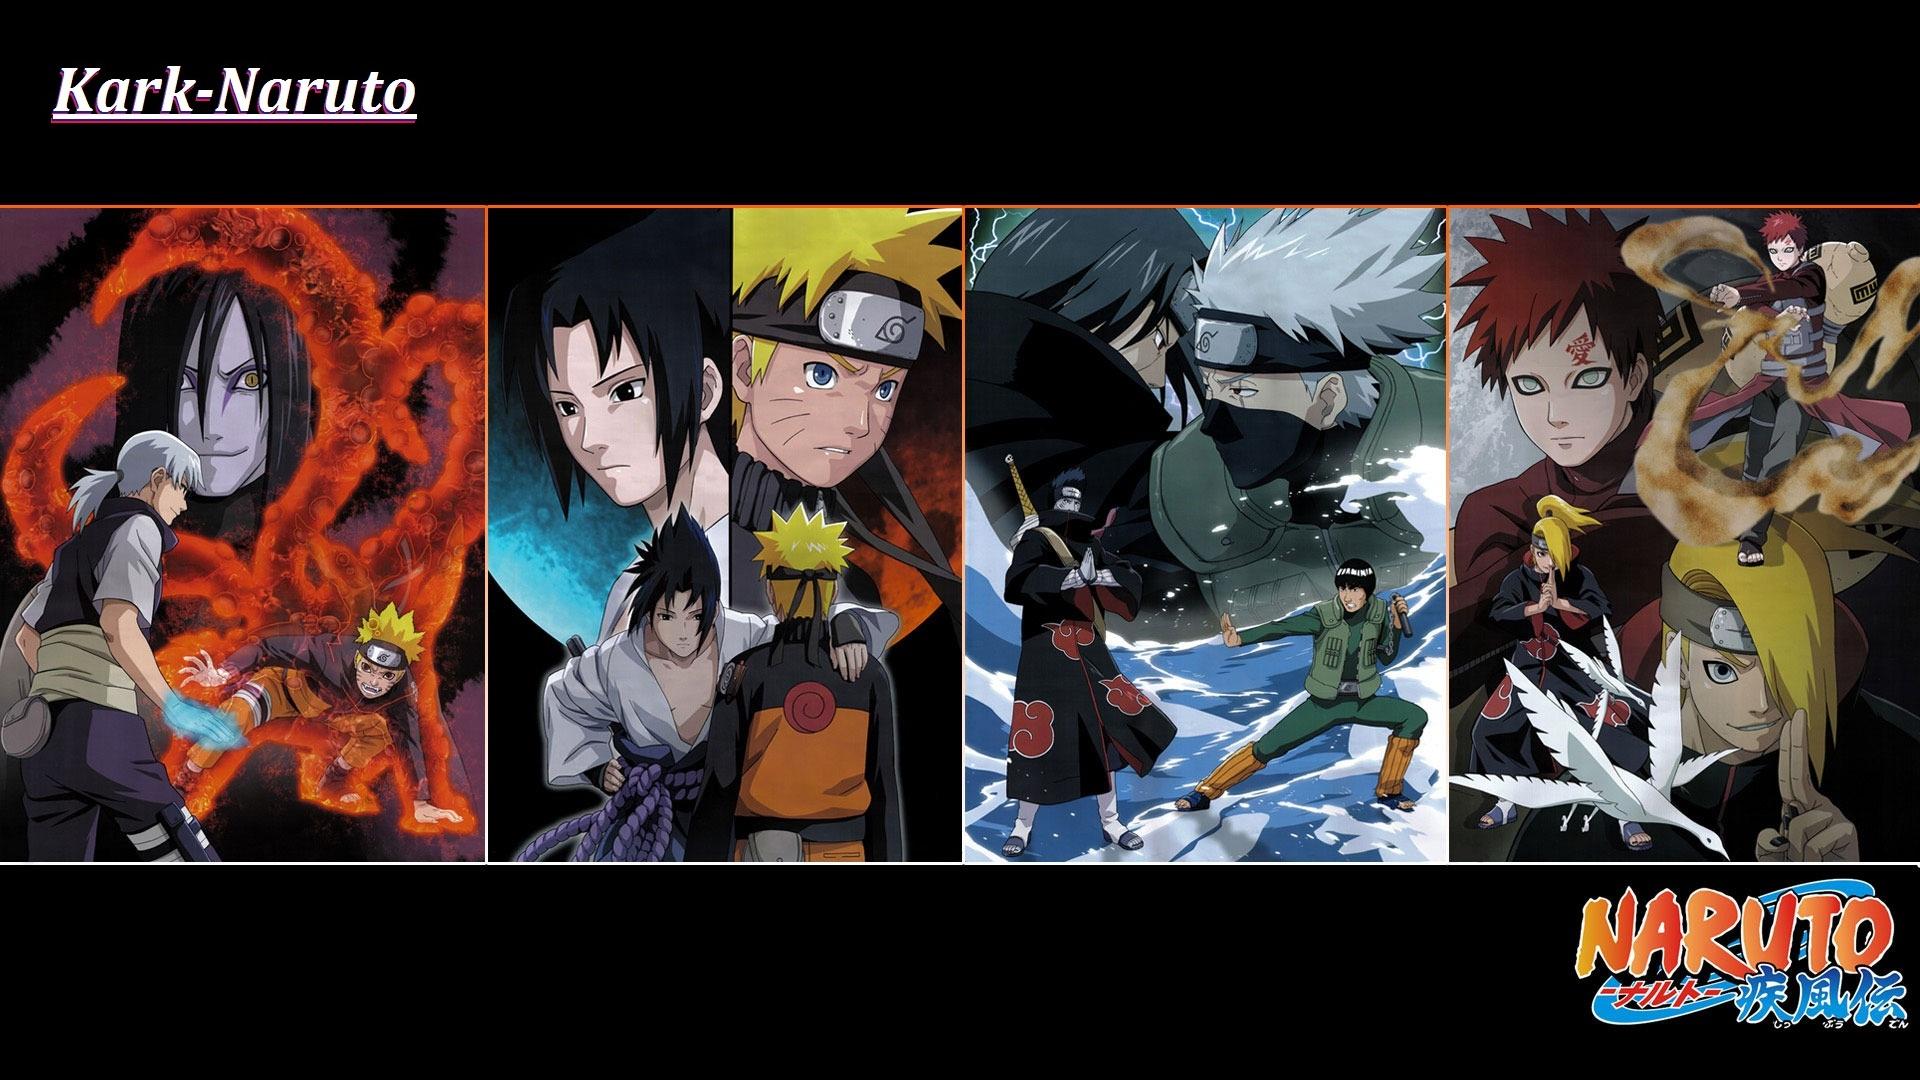 Naruto shippuden Wallpaper39;s image  KarkNaruto  Mod DB